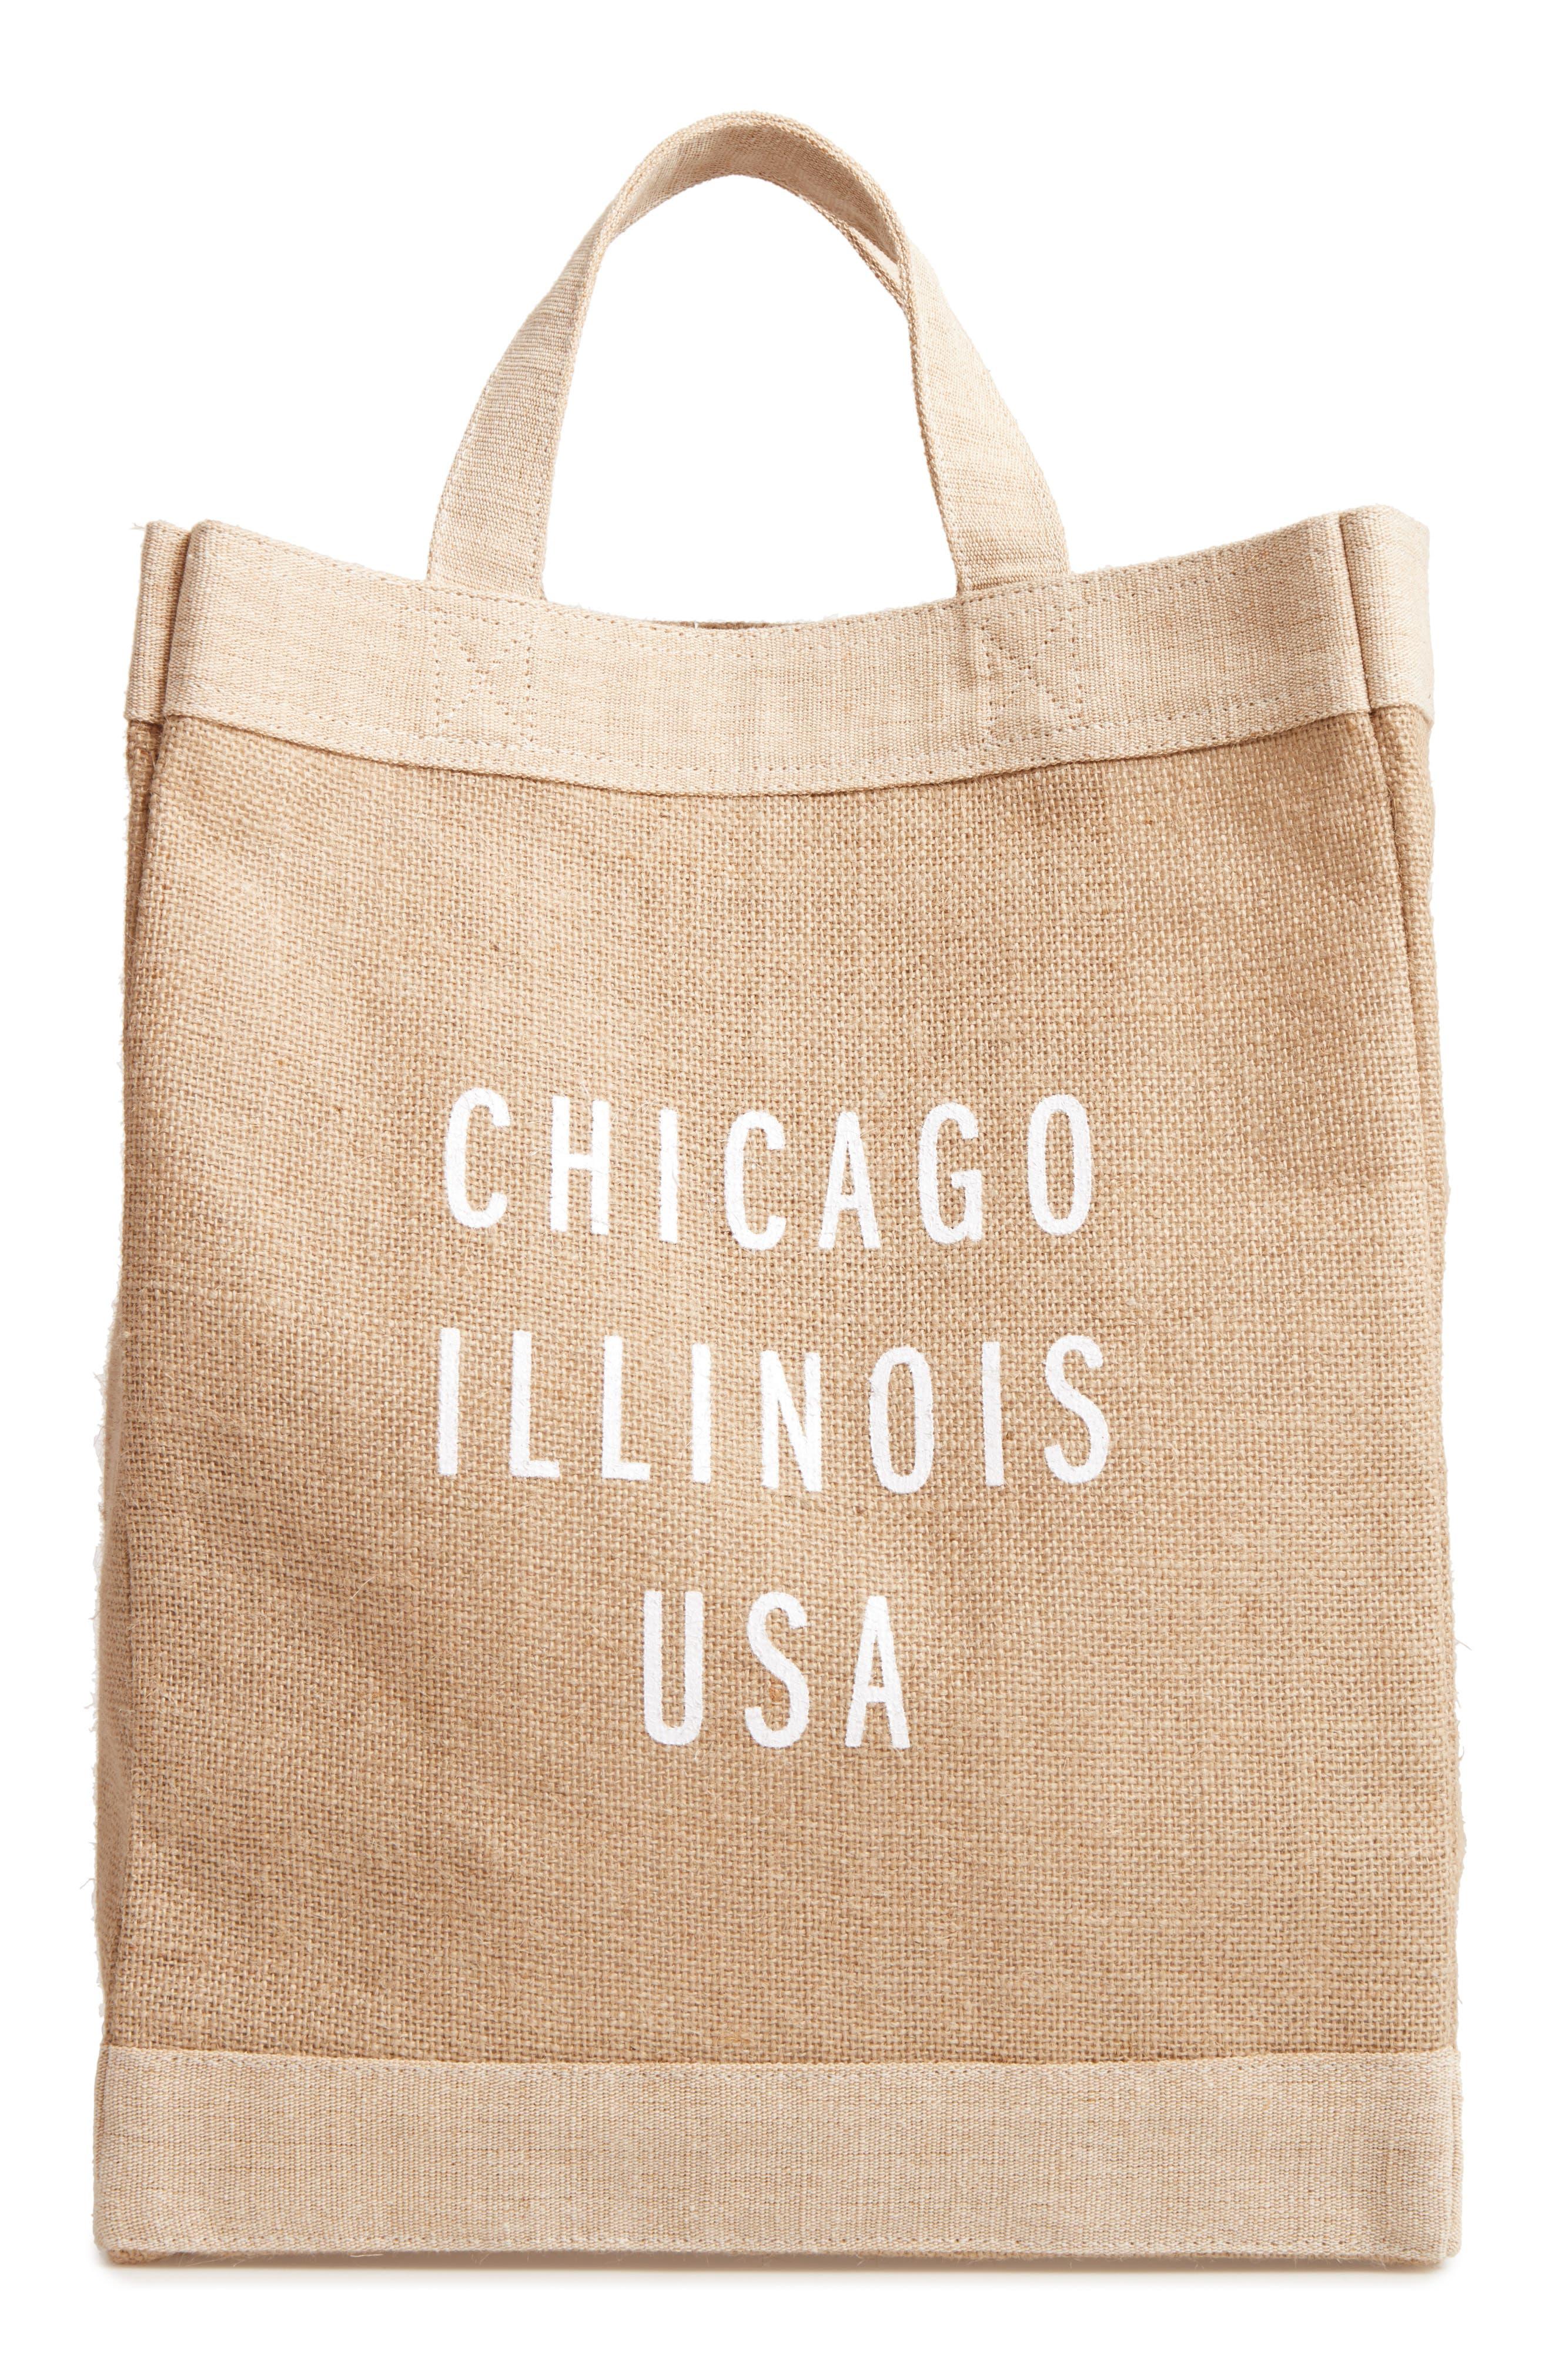 Chicago Simple Market Bag,                             Main thumbnail 1, color,